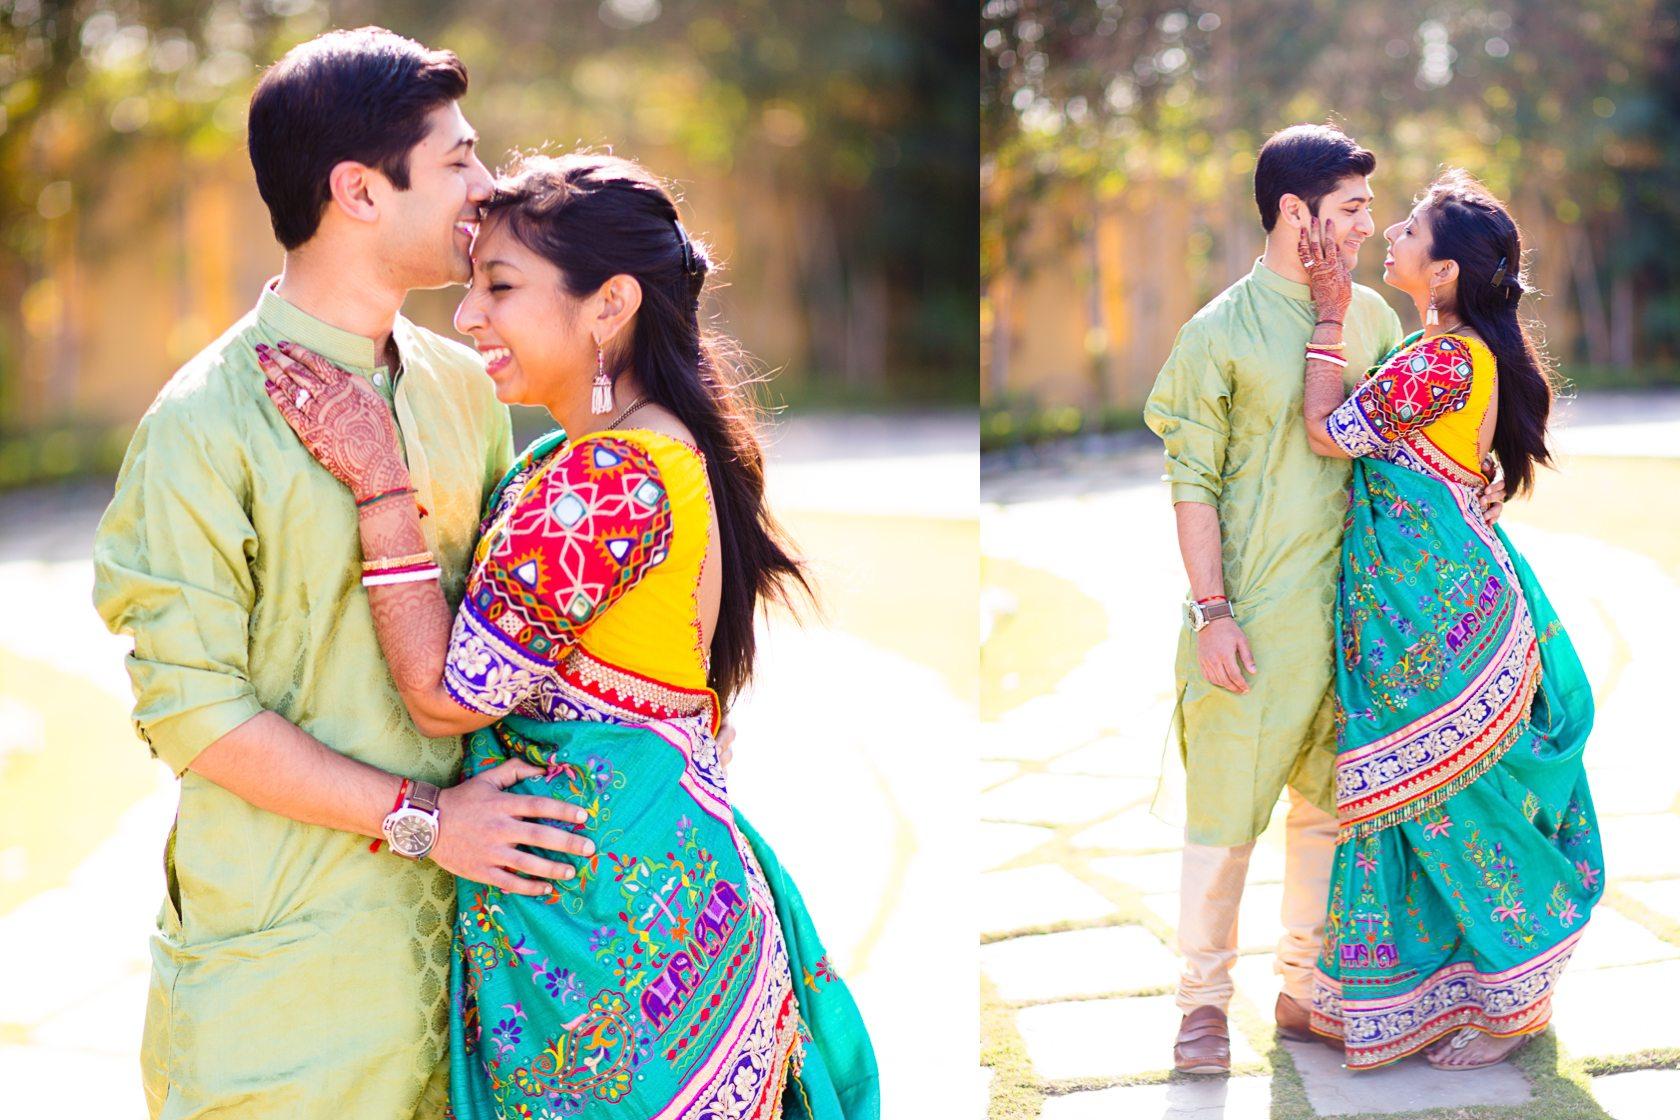 India_Wedding_206.jpg